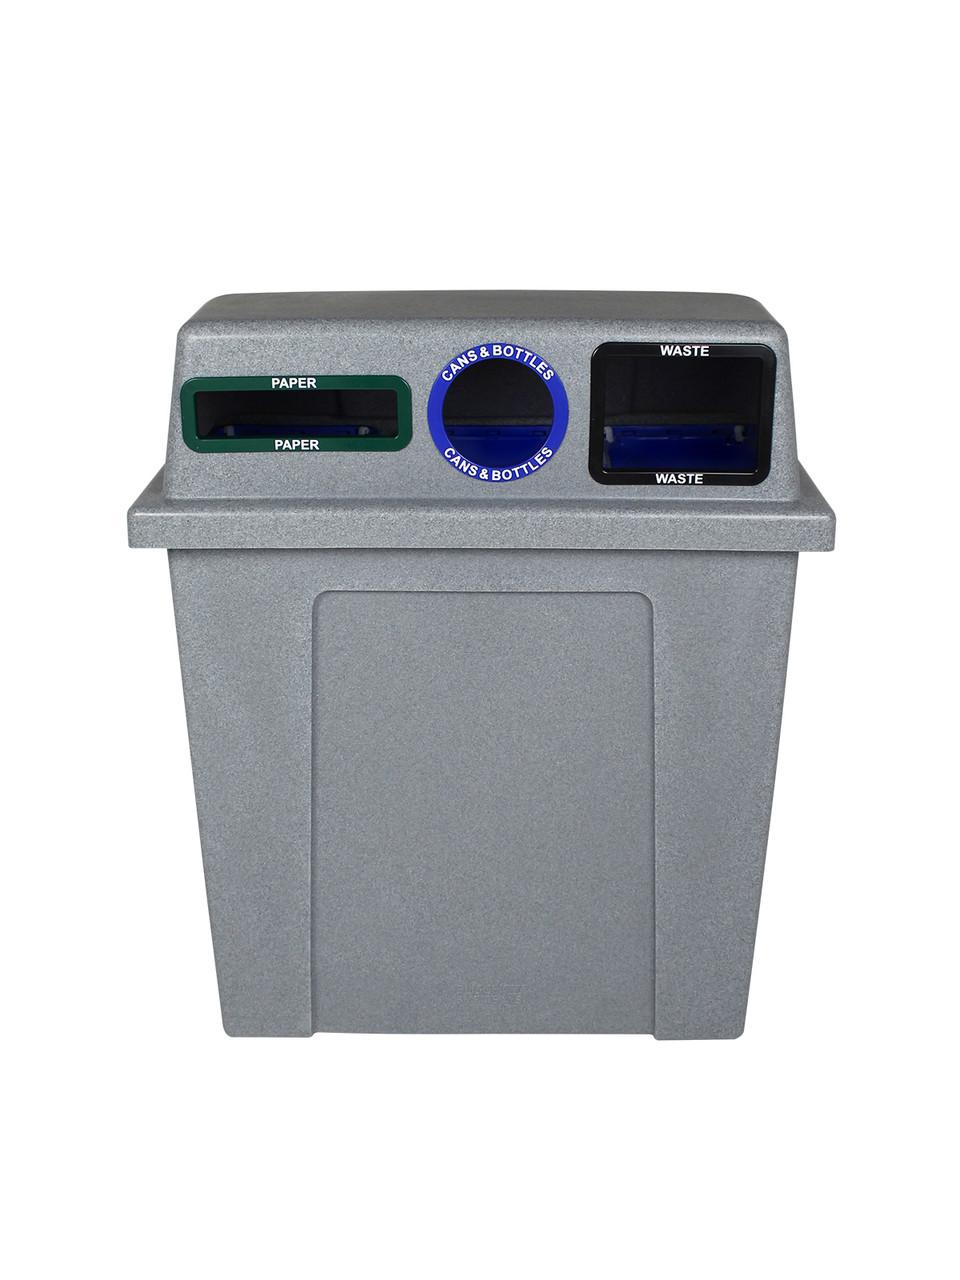 96 Gallon Plastic Dual 3 in 1 Recycling Bin Graystone 101438 (Slot, Circle, Full)